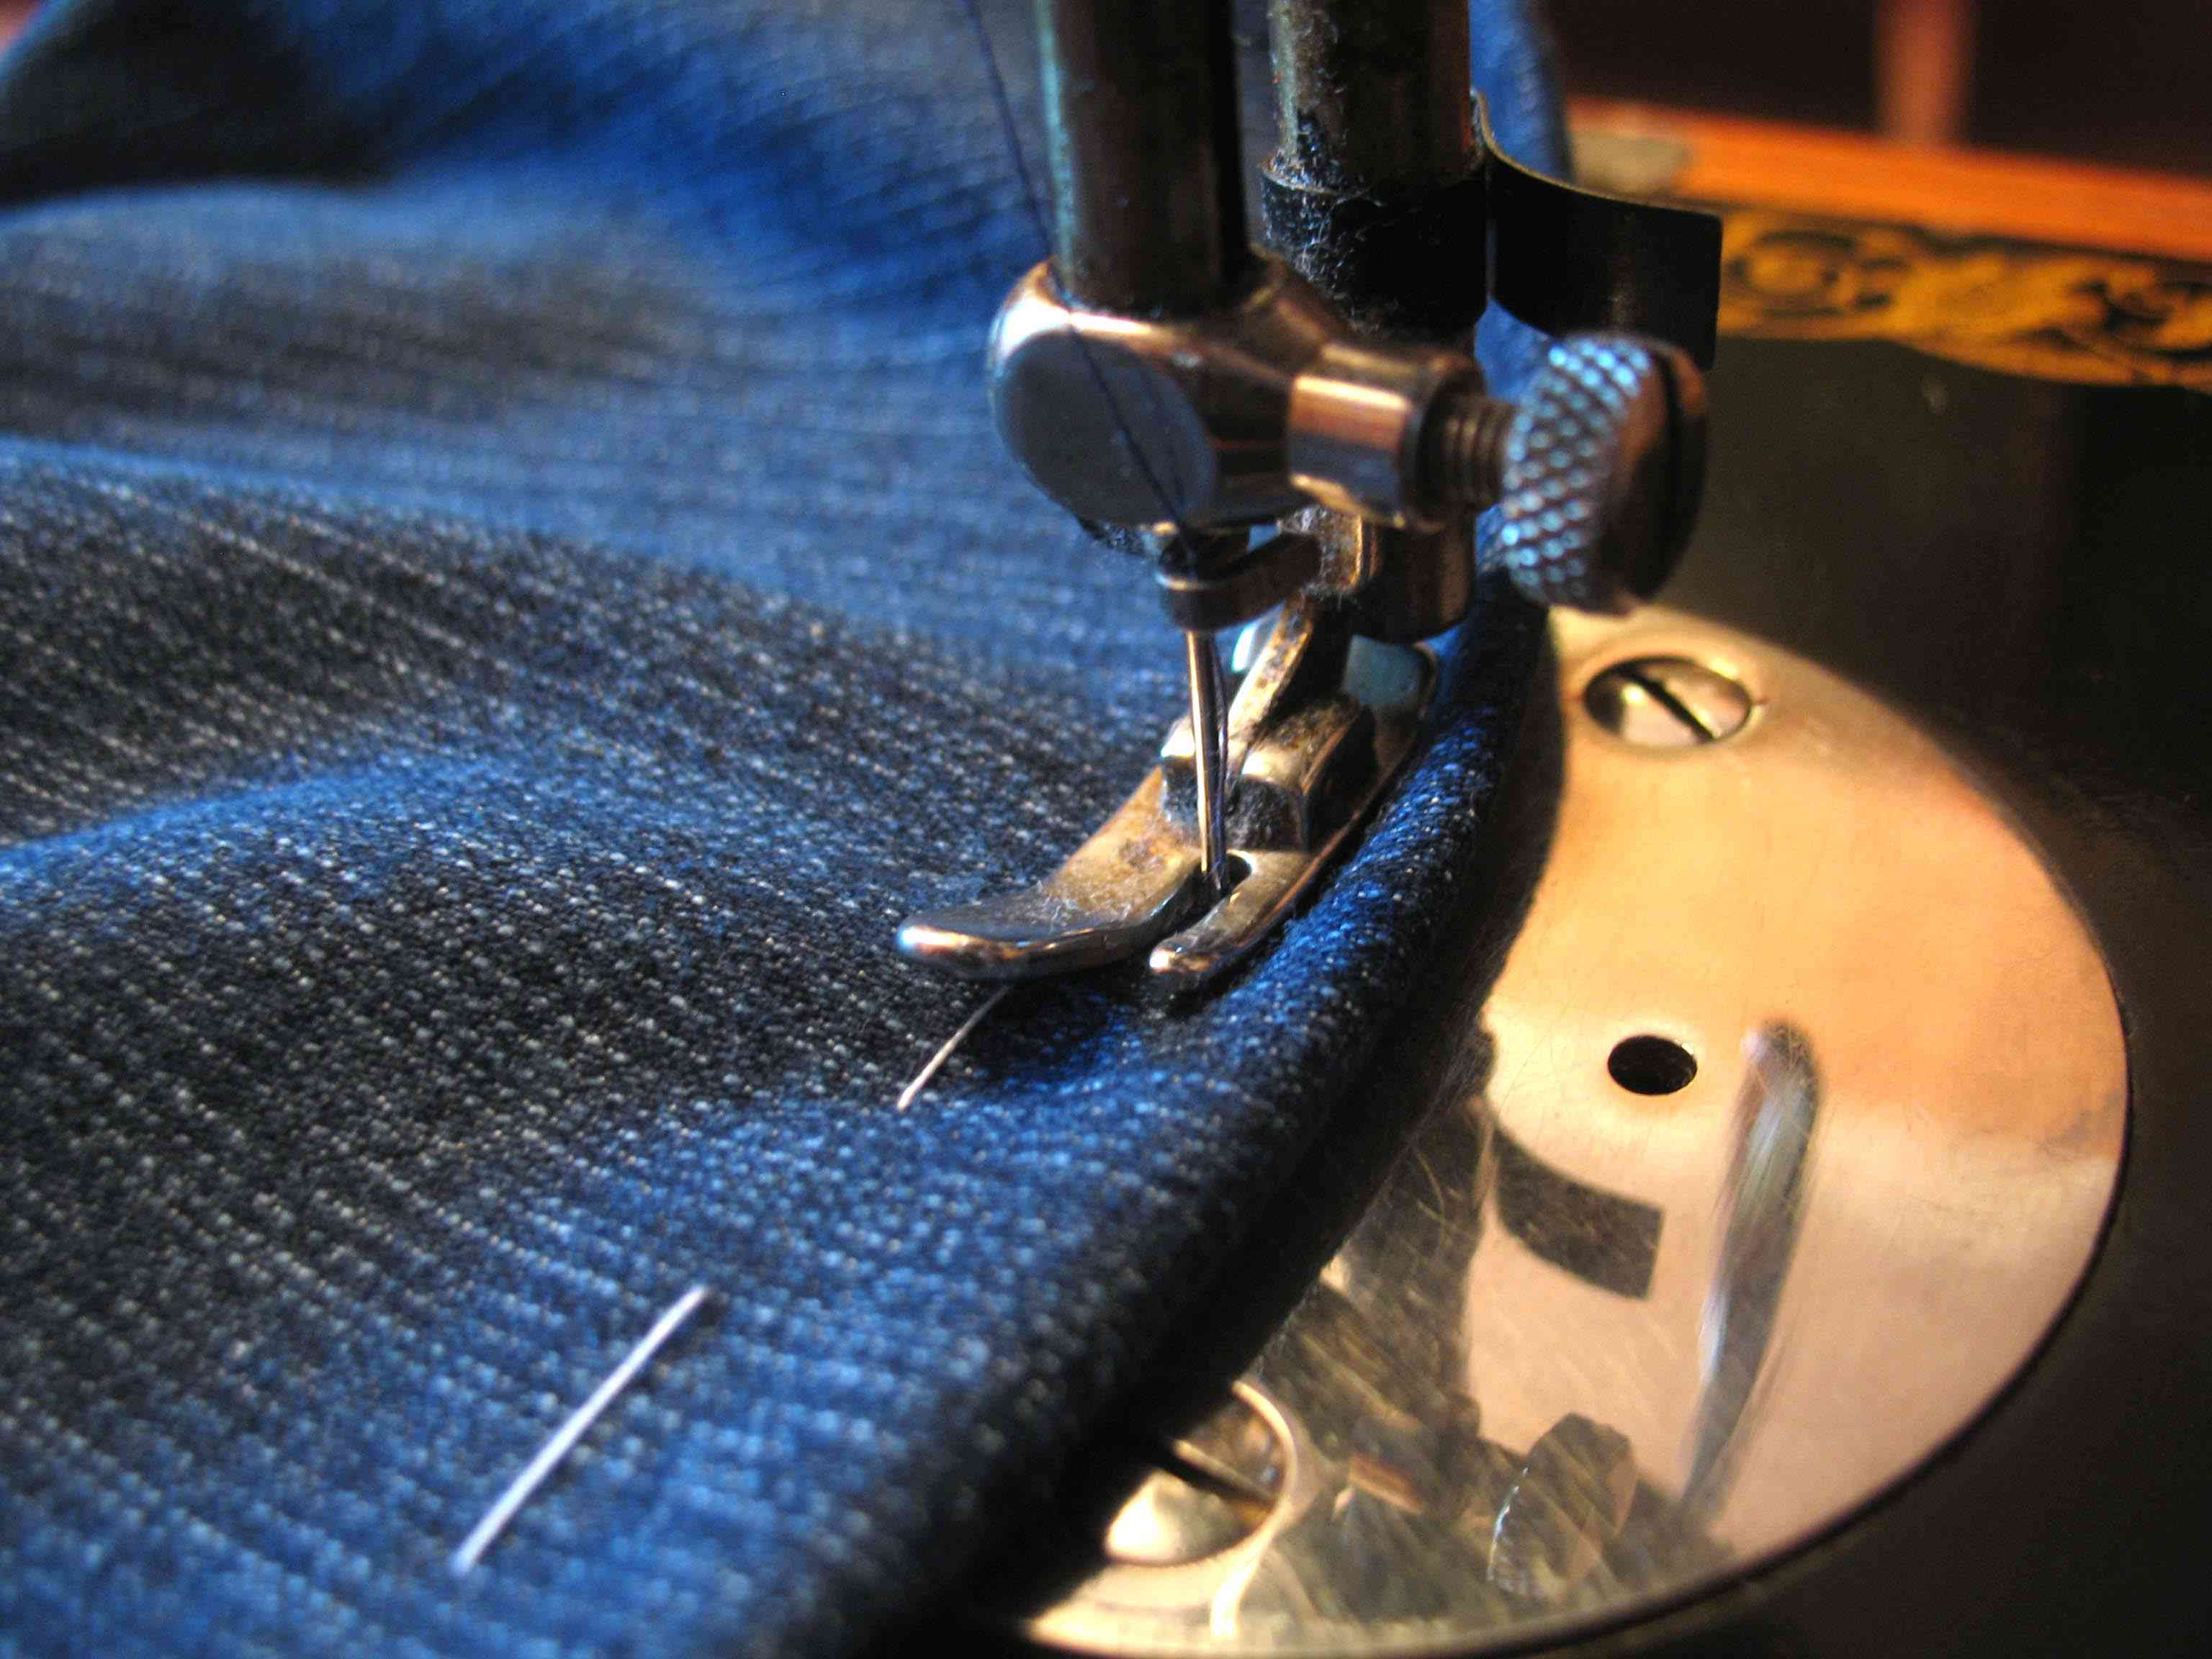 sewing machine stitches